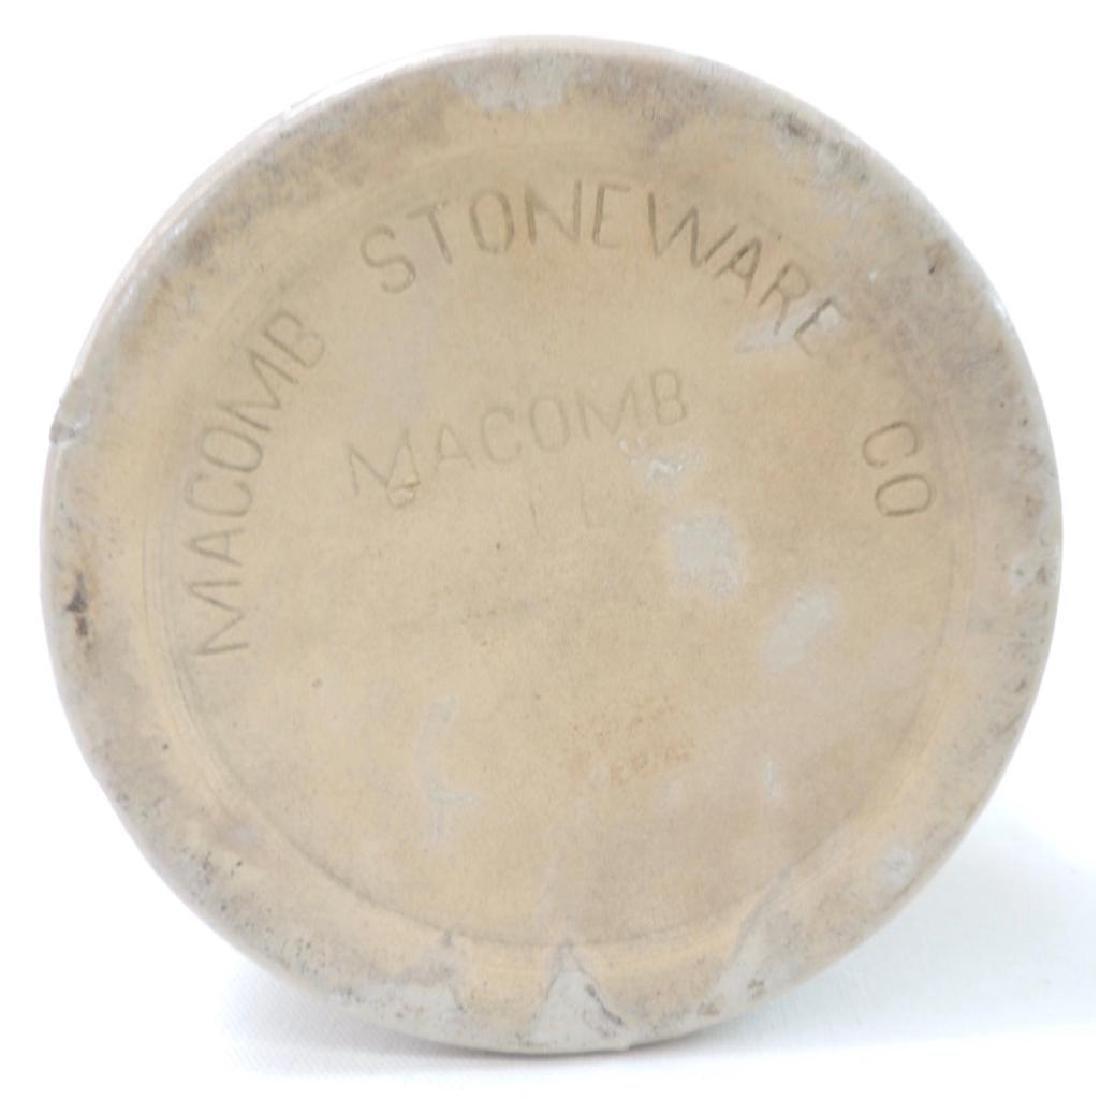 2 Macomb Stoneware Co Crock Jugs - 4